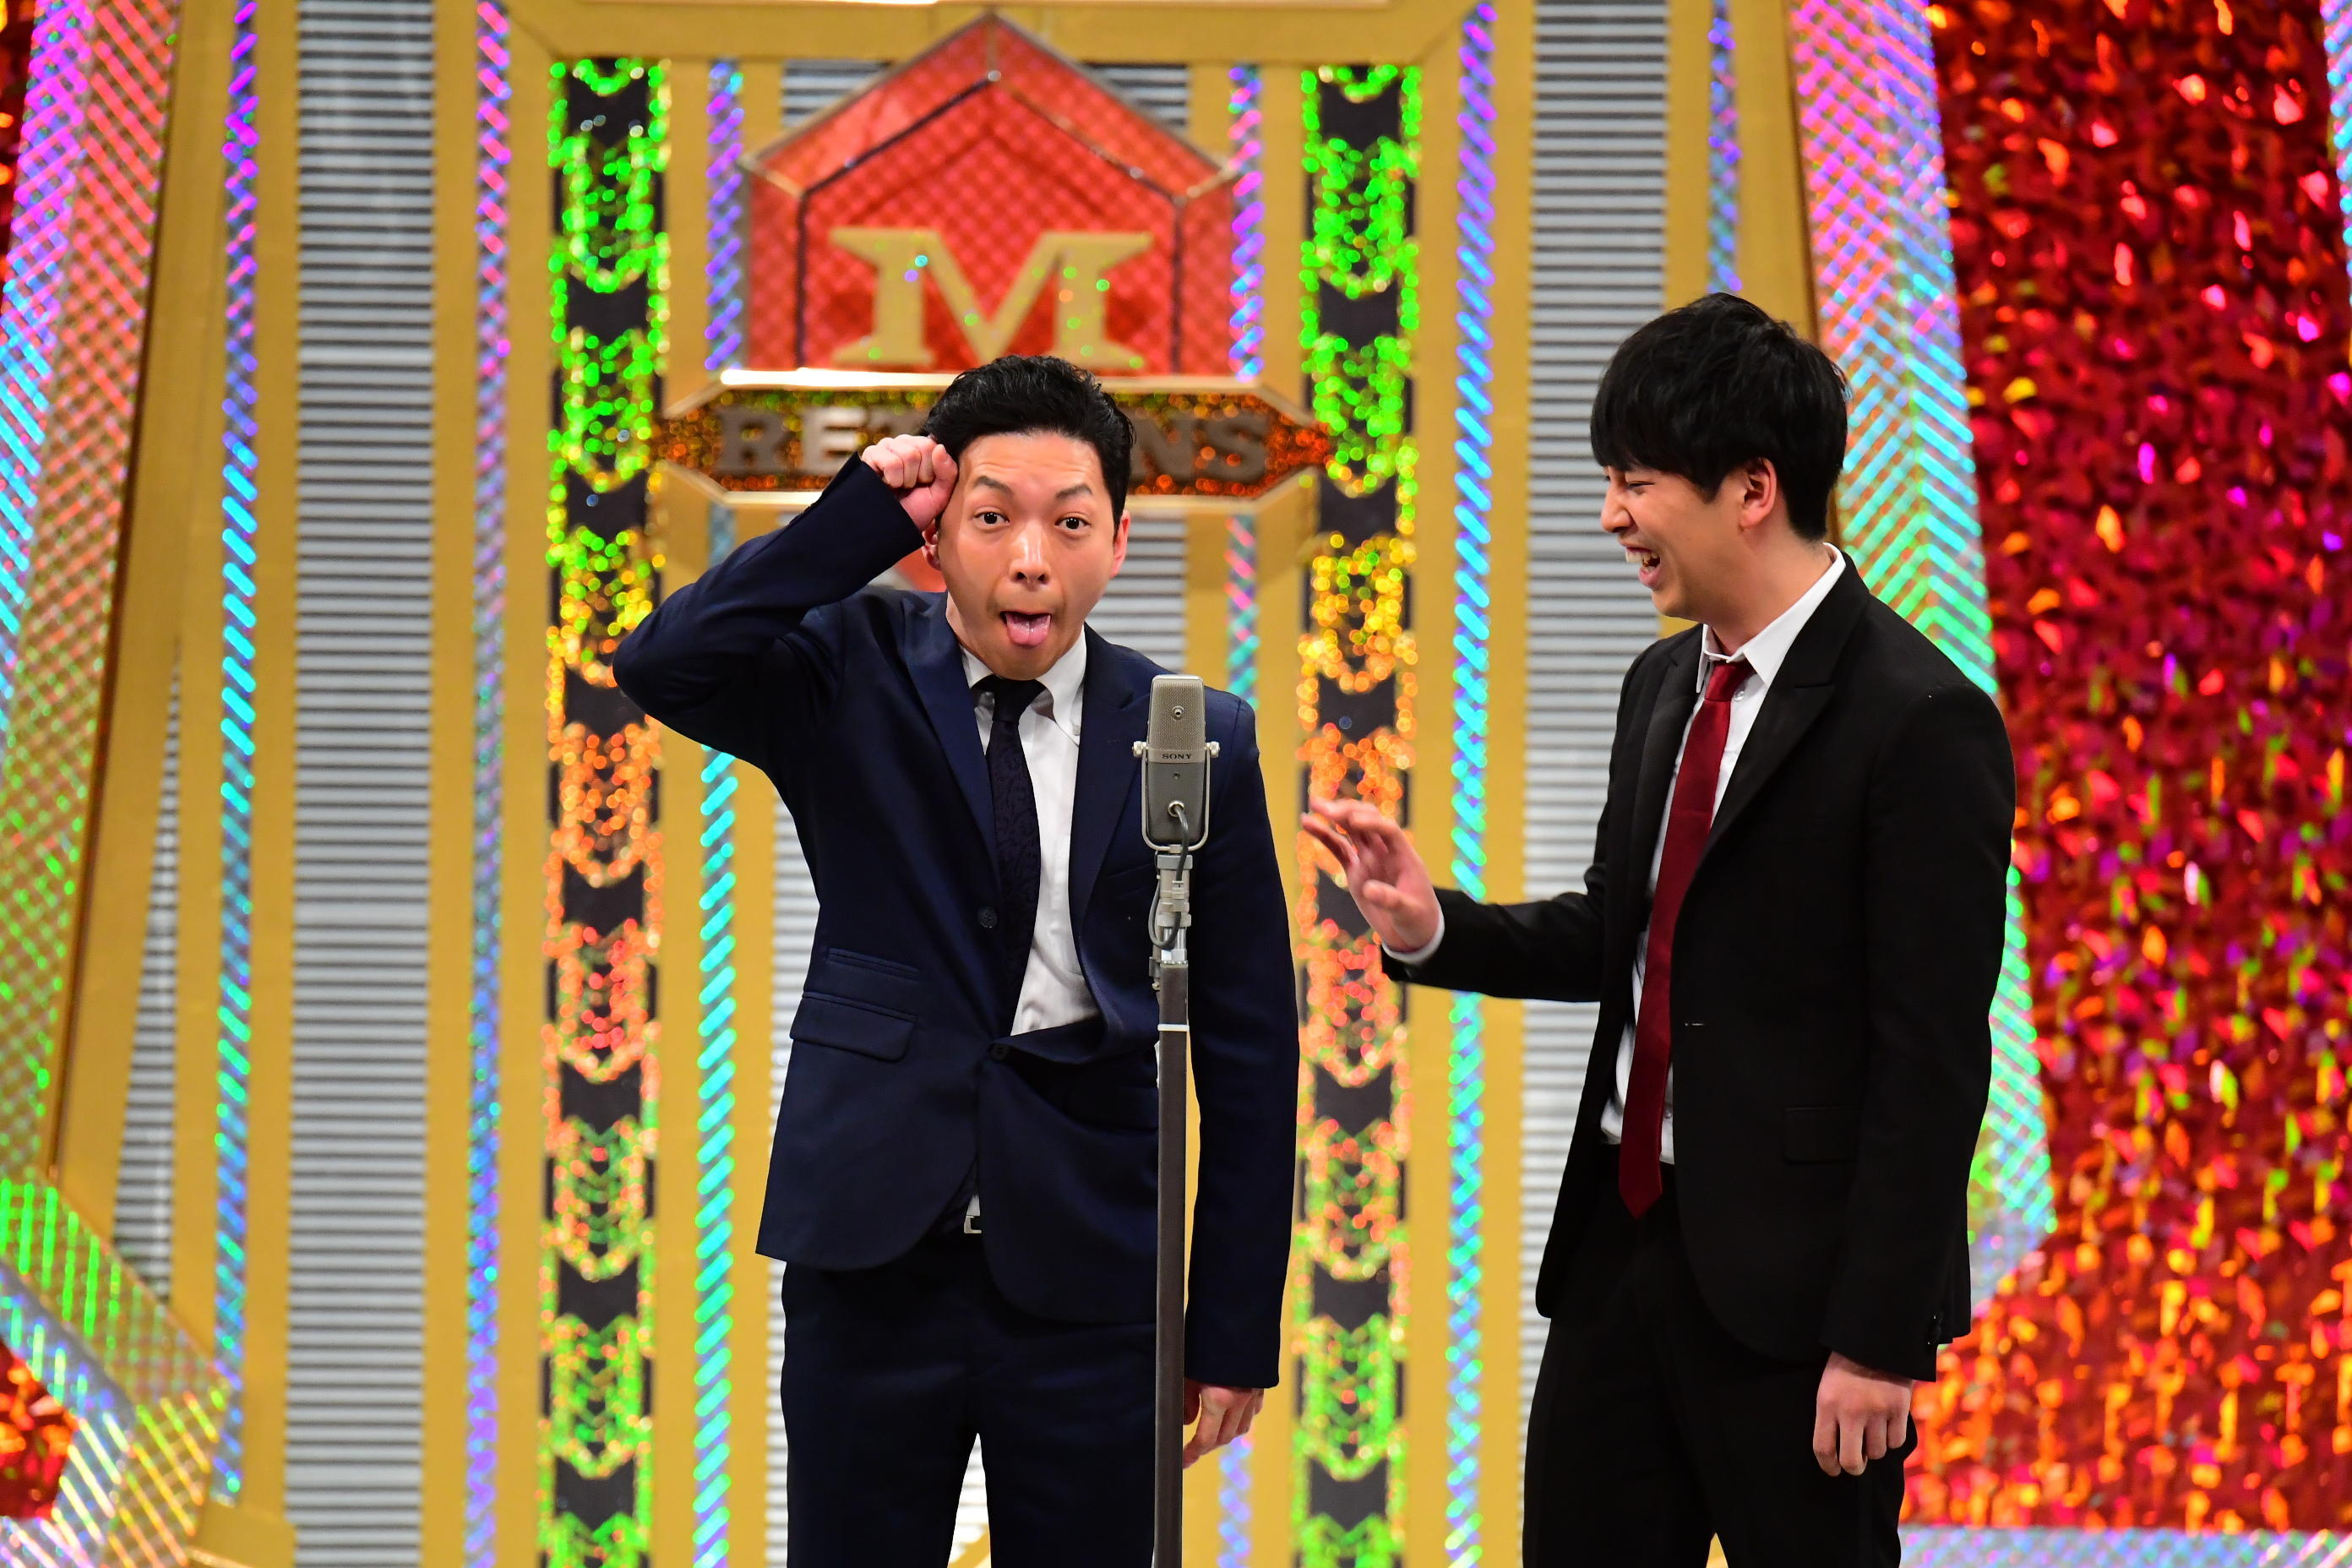 http://news.yoshimoto.co.jp/20170228155414-53dd057d3fc1b1f7570ddfaae75e042b59e96901.jpg